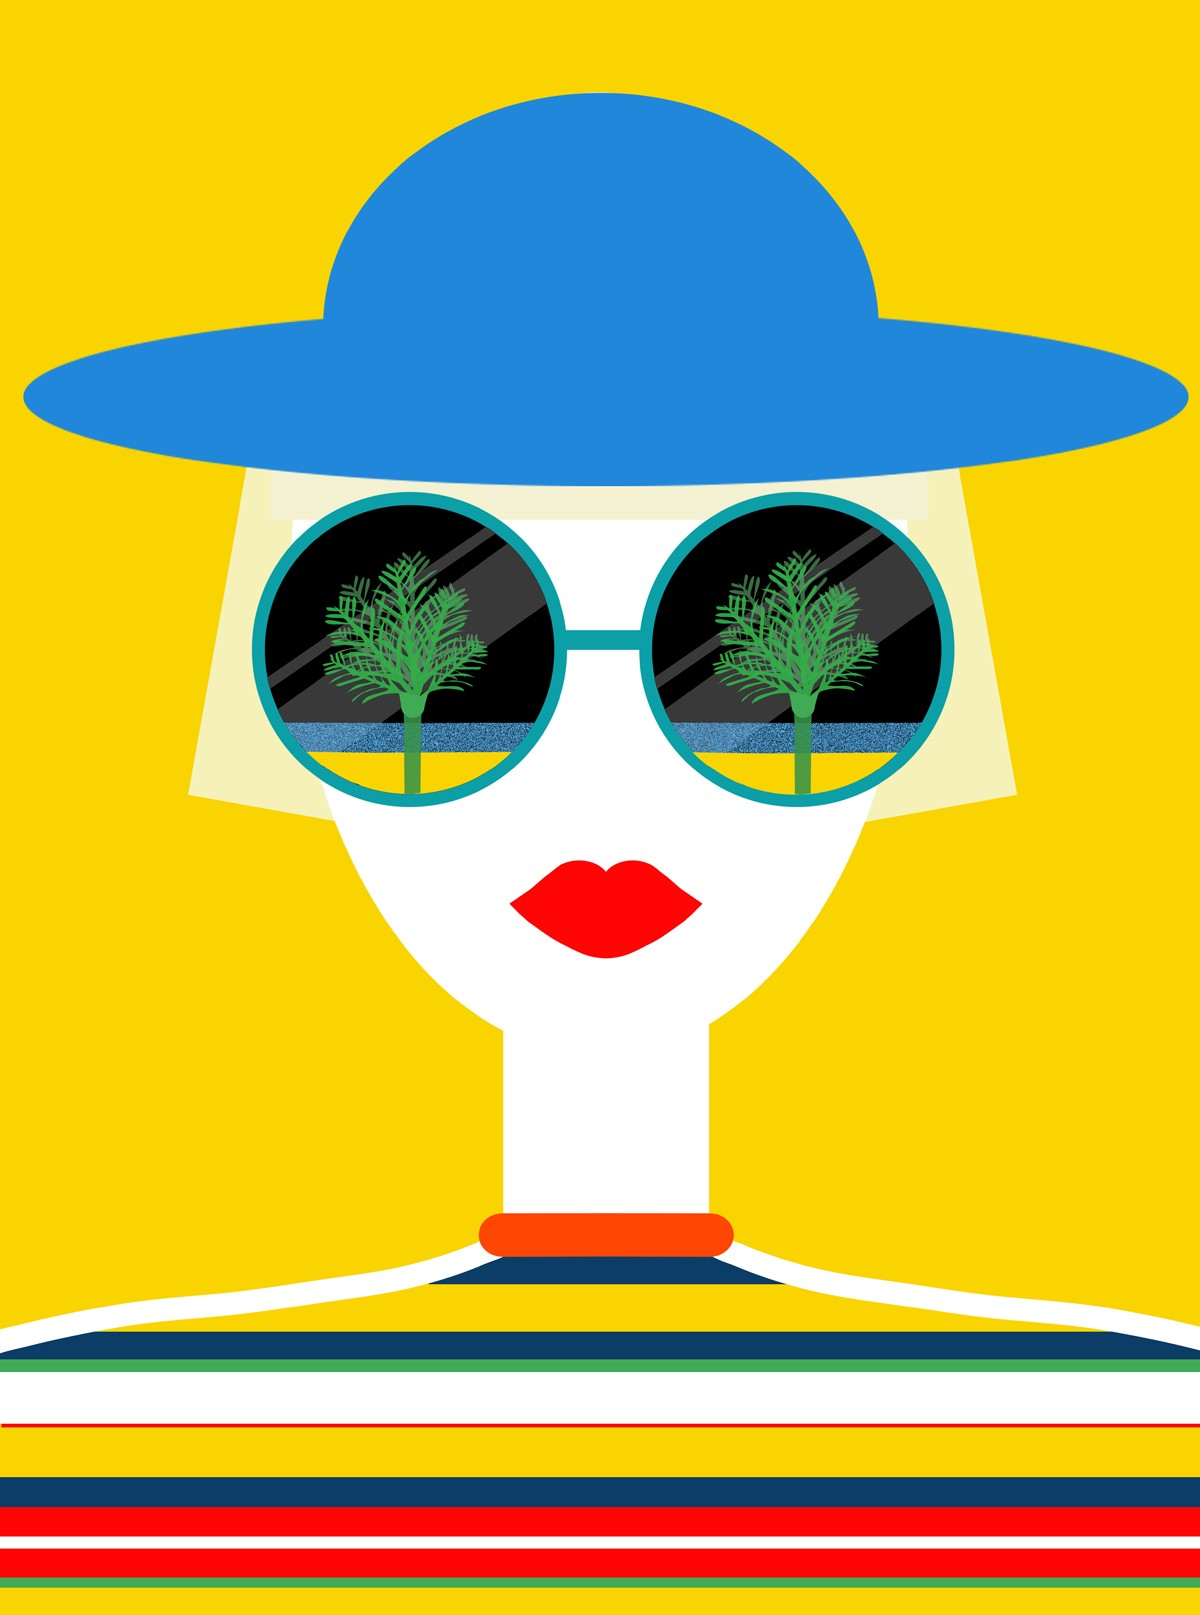 Ana Jaks (Anya Jackson), Sunglasses, One Year On New Designers 2016